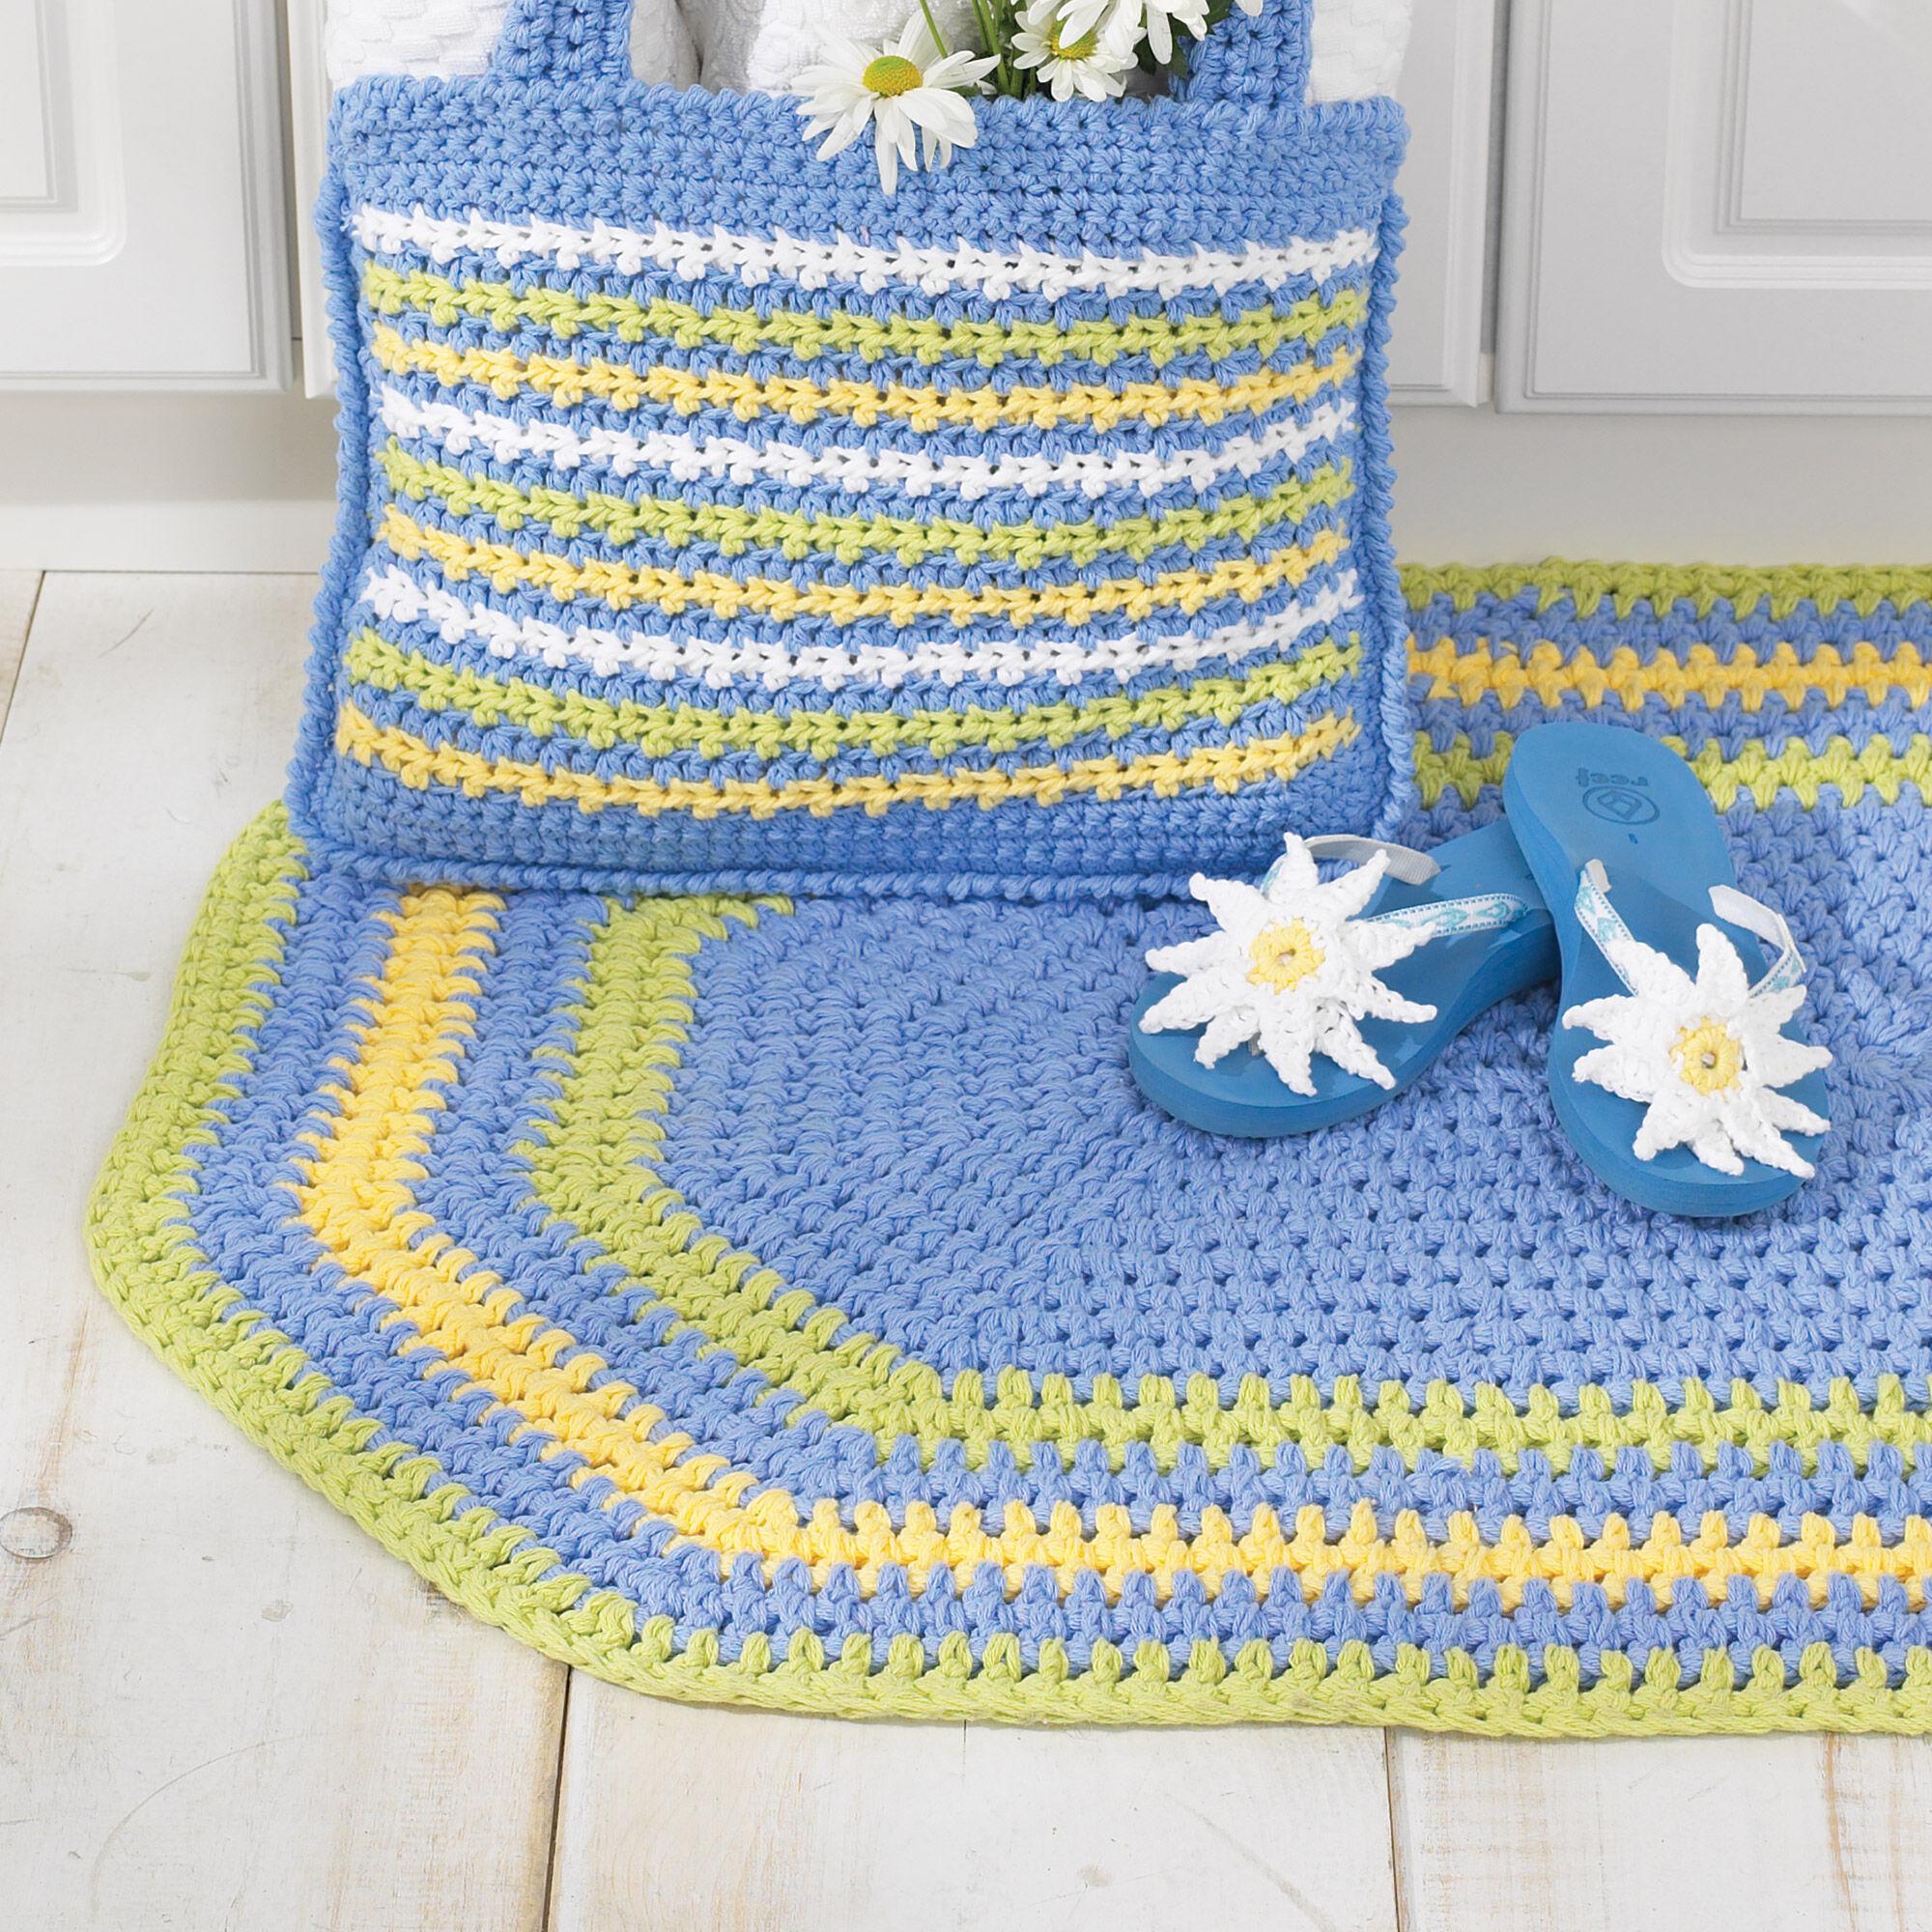 Crochet Oval Pattern Interesting Design Inspiration